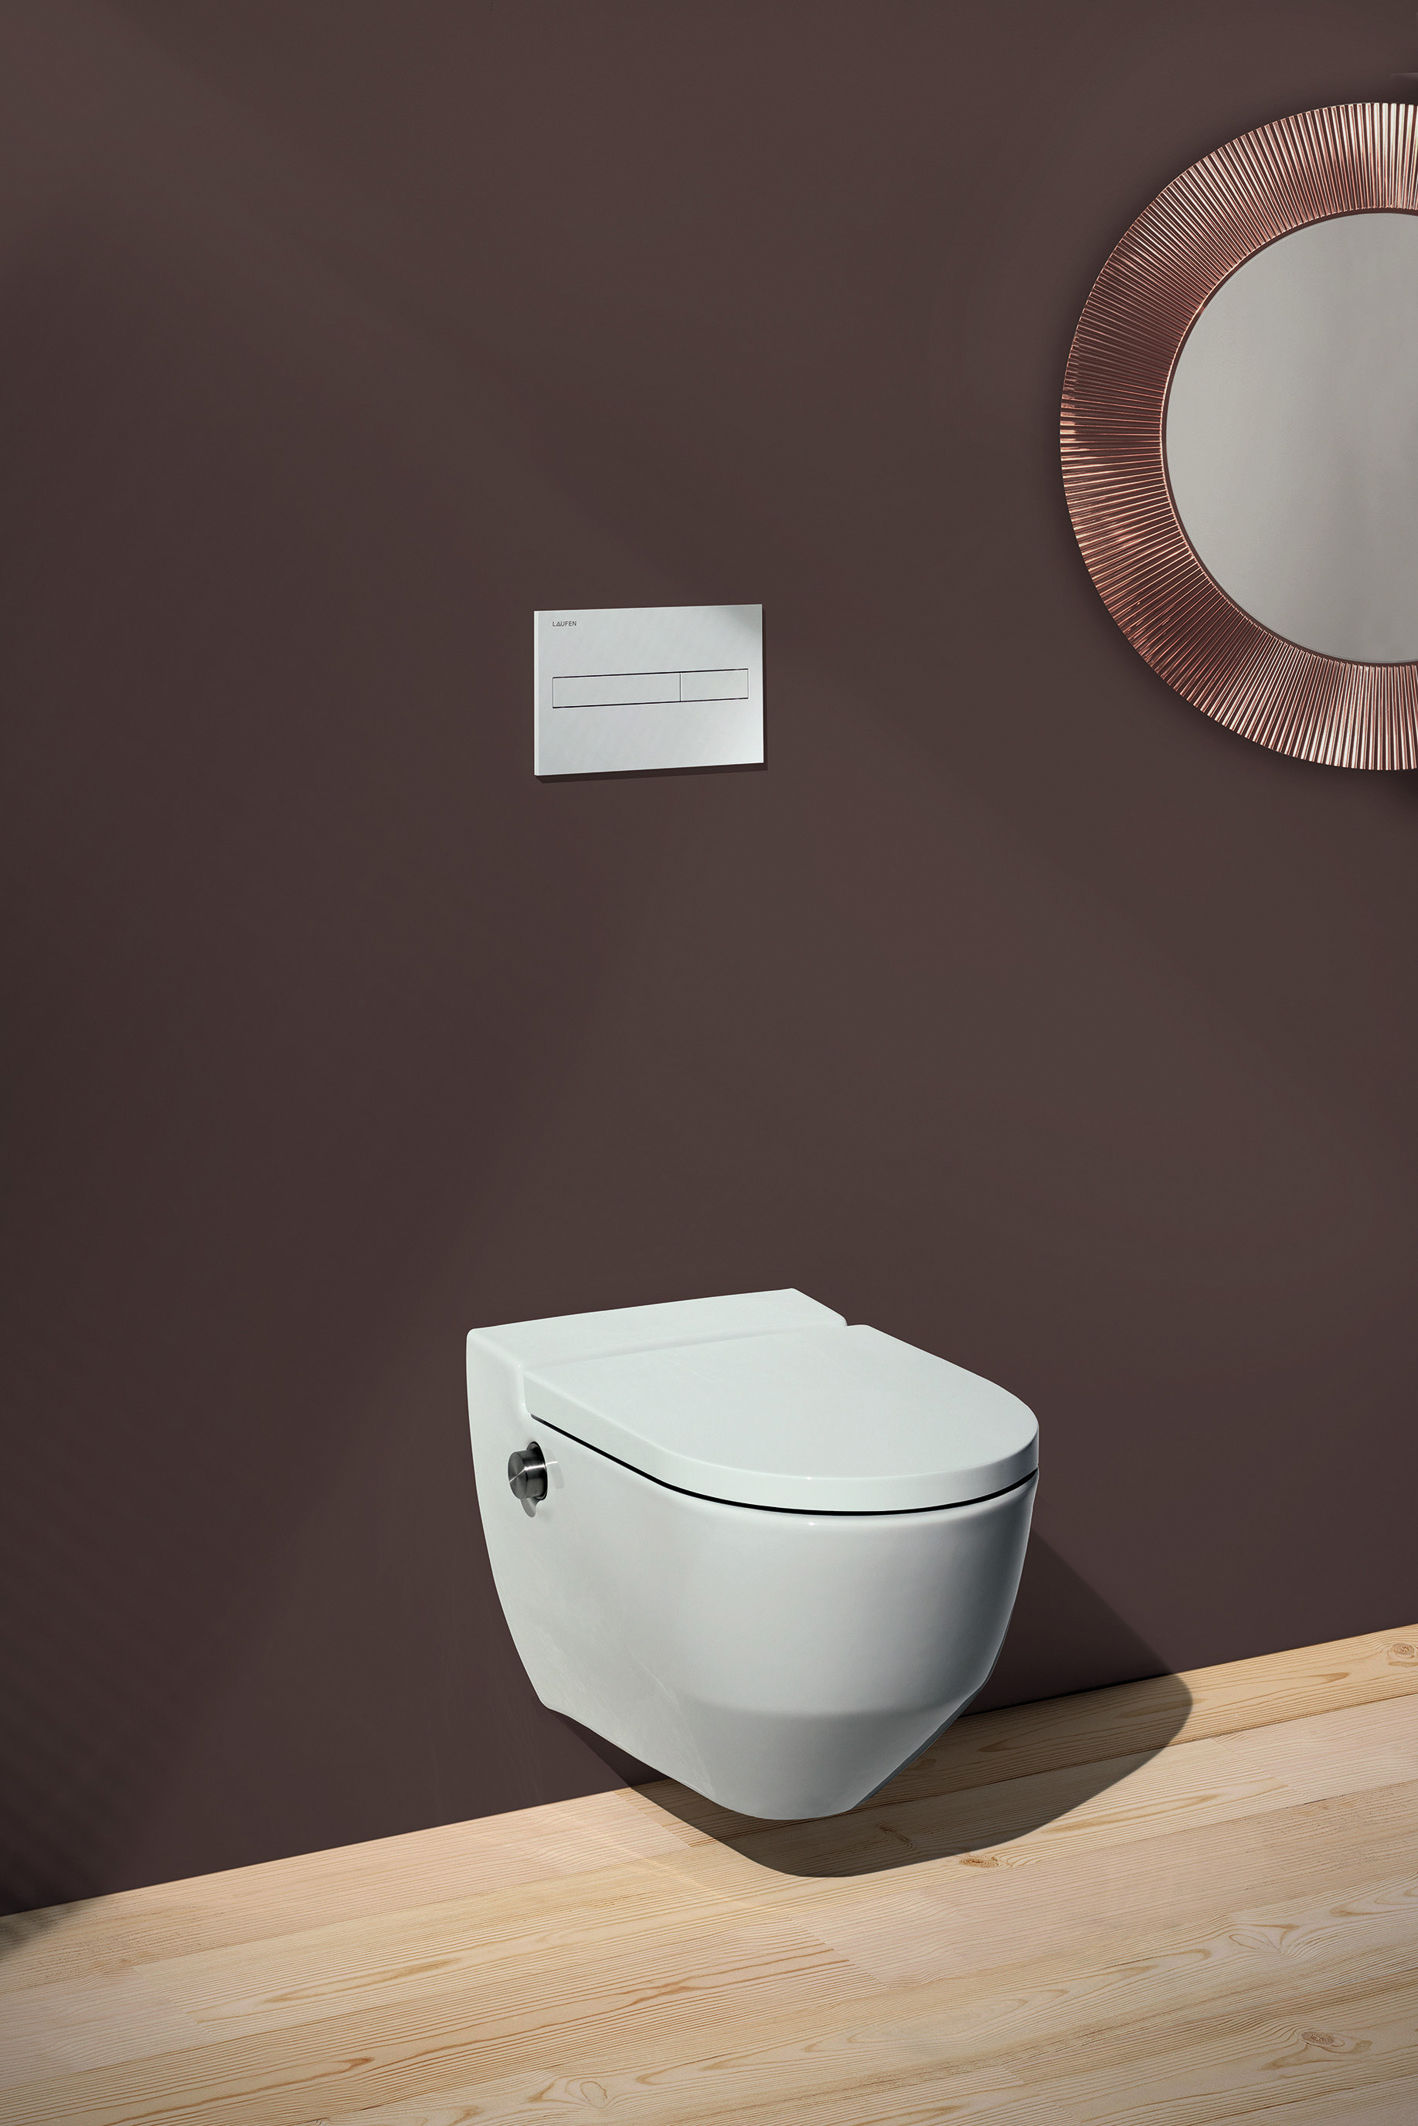 Dusch Wc Wasser Statt Papier Hauser Modernisieren